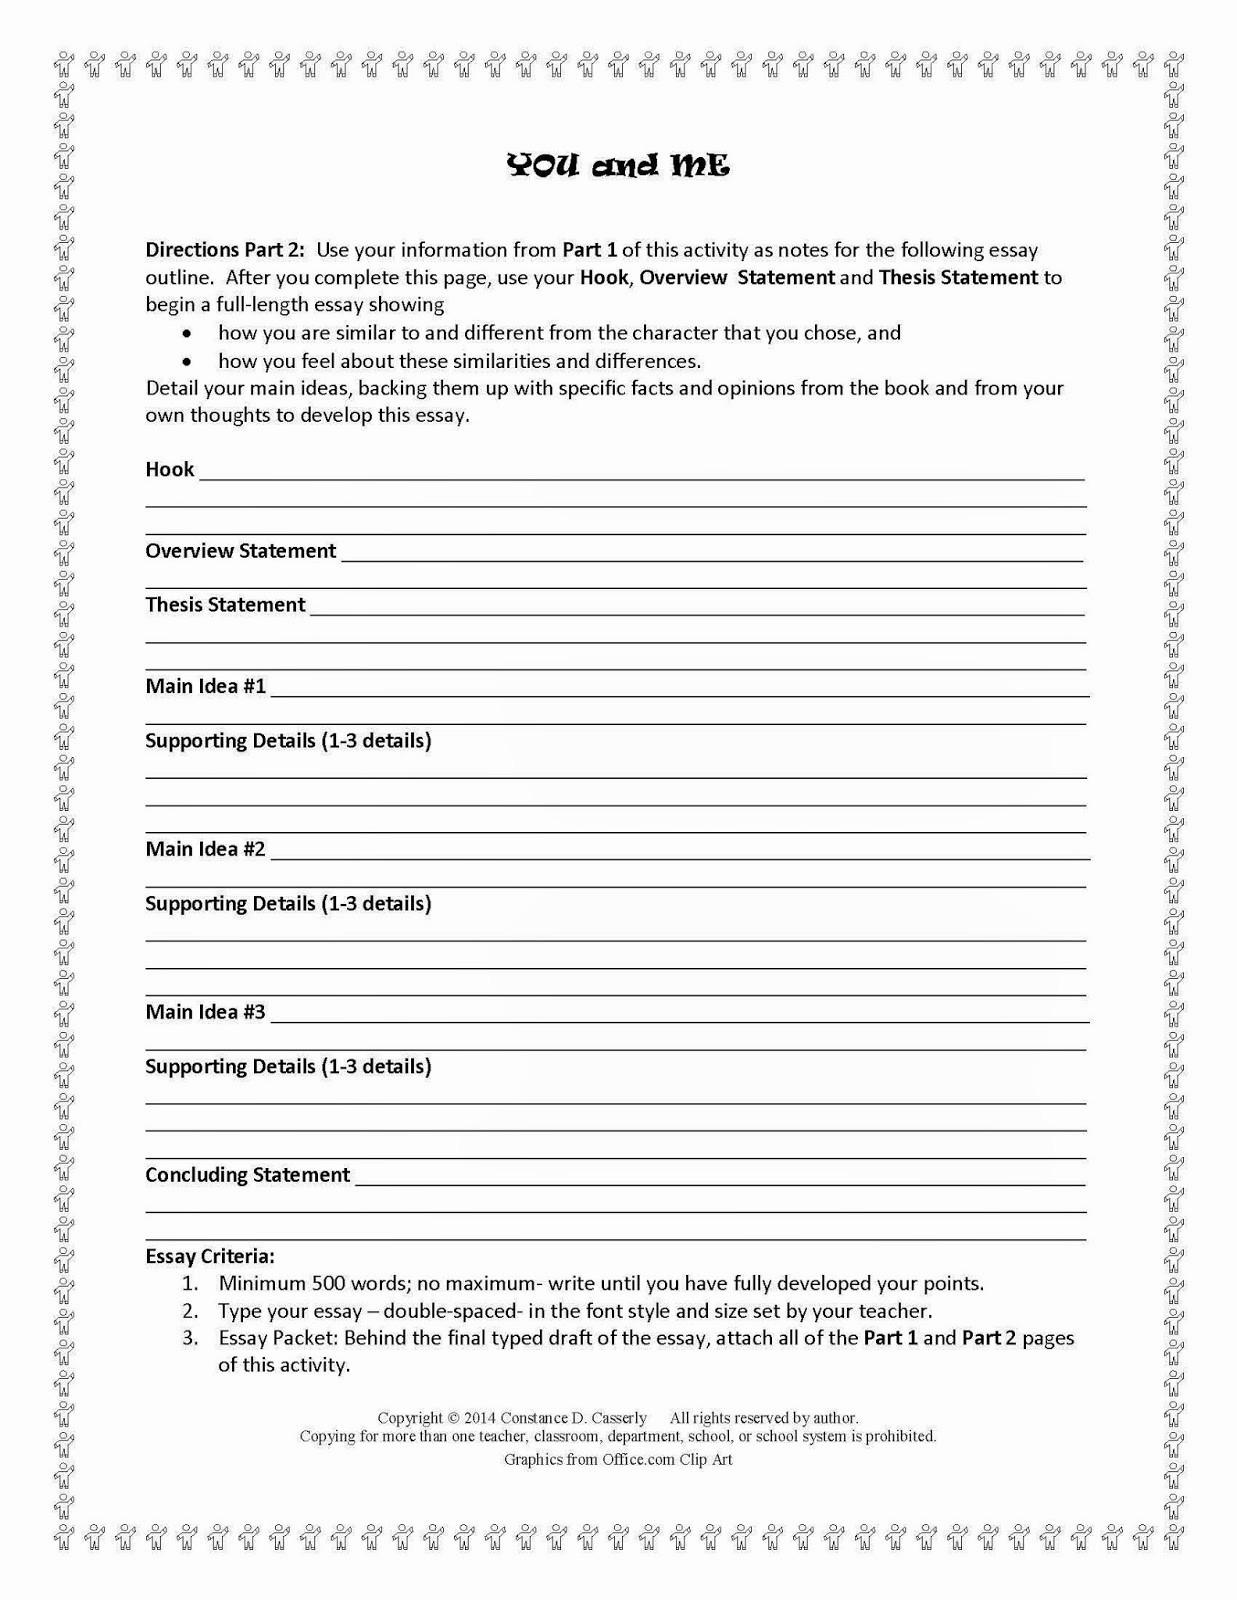 500 Word Essay Mla format Beautiful 500 Word Scholarship Essay Examples